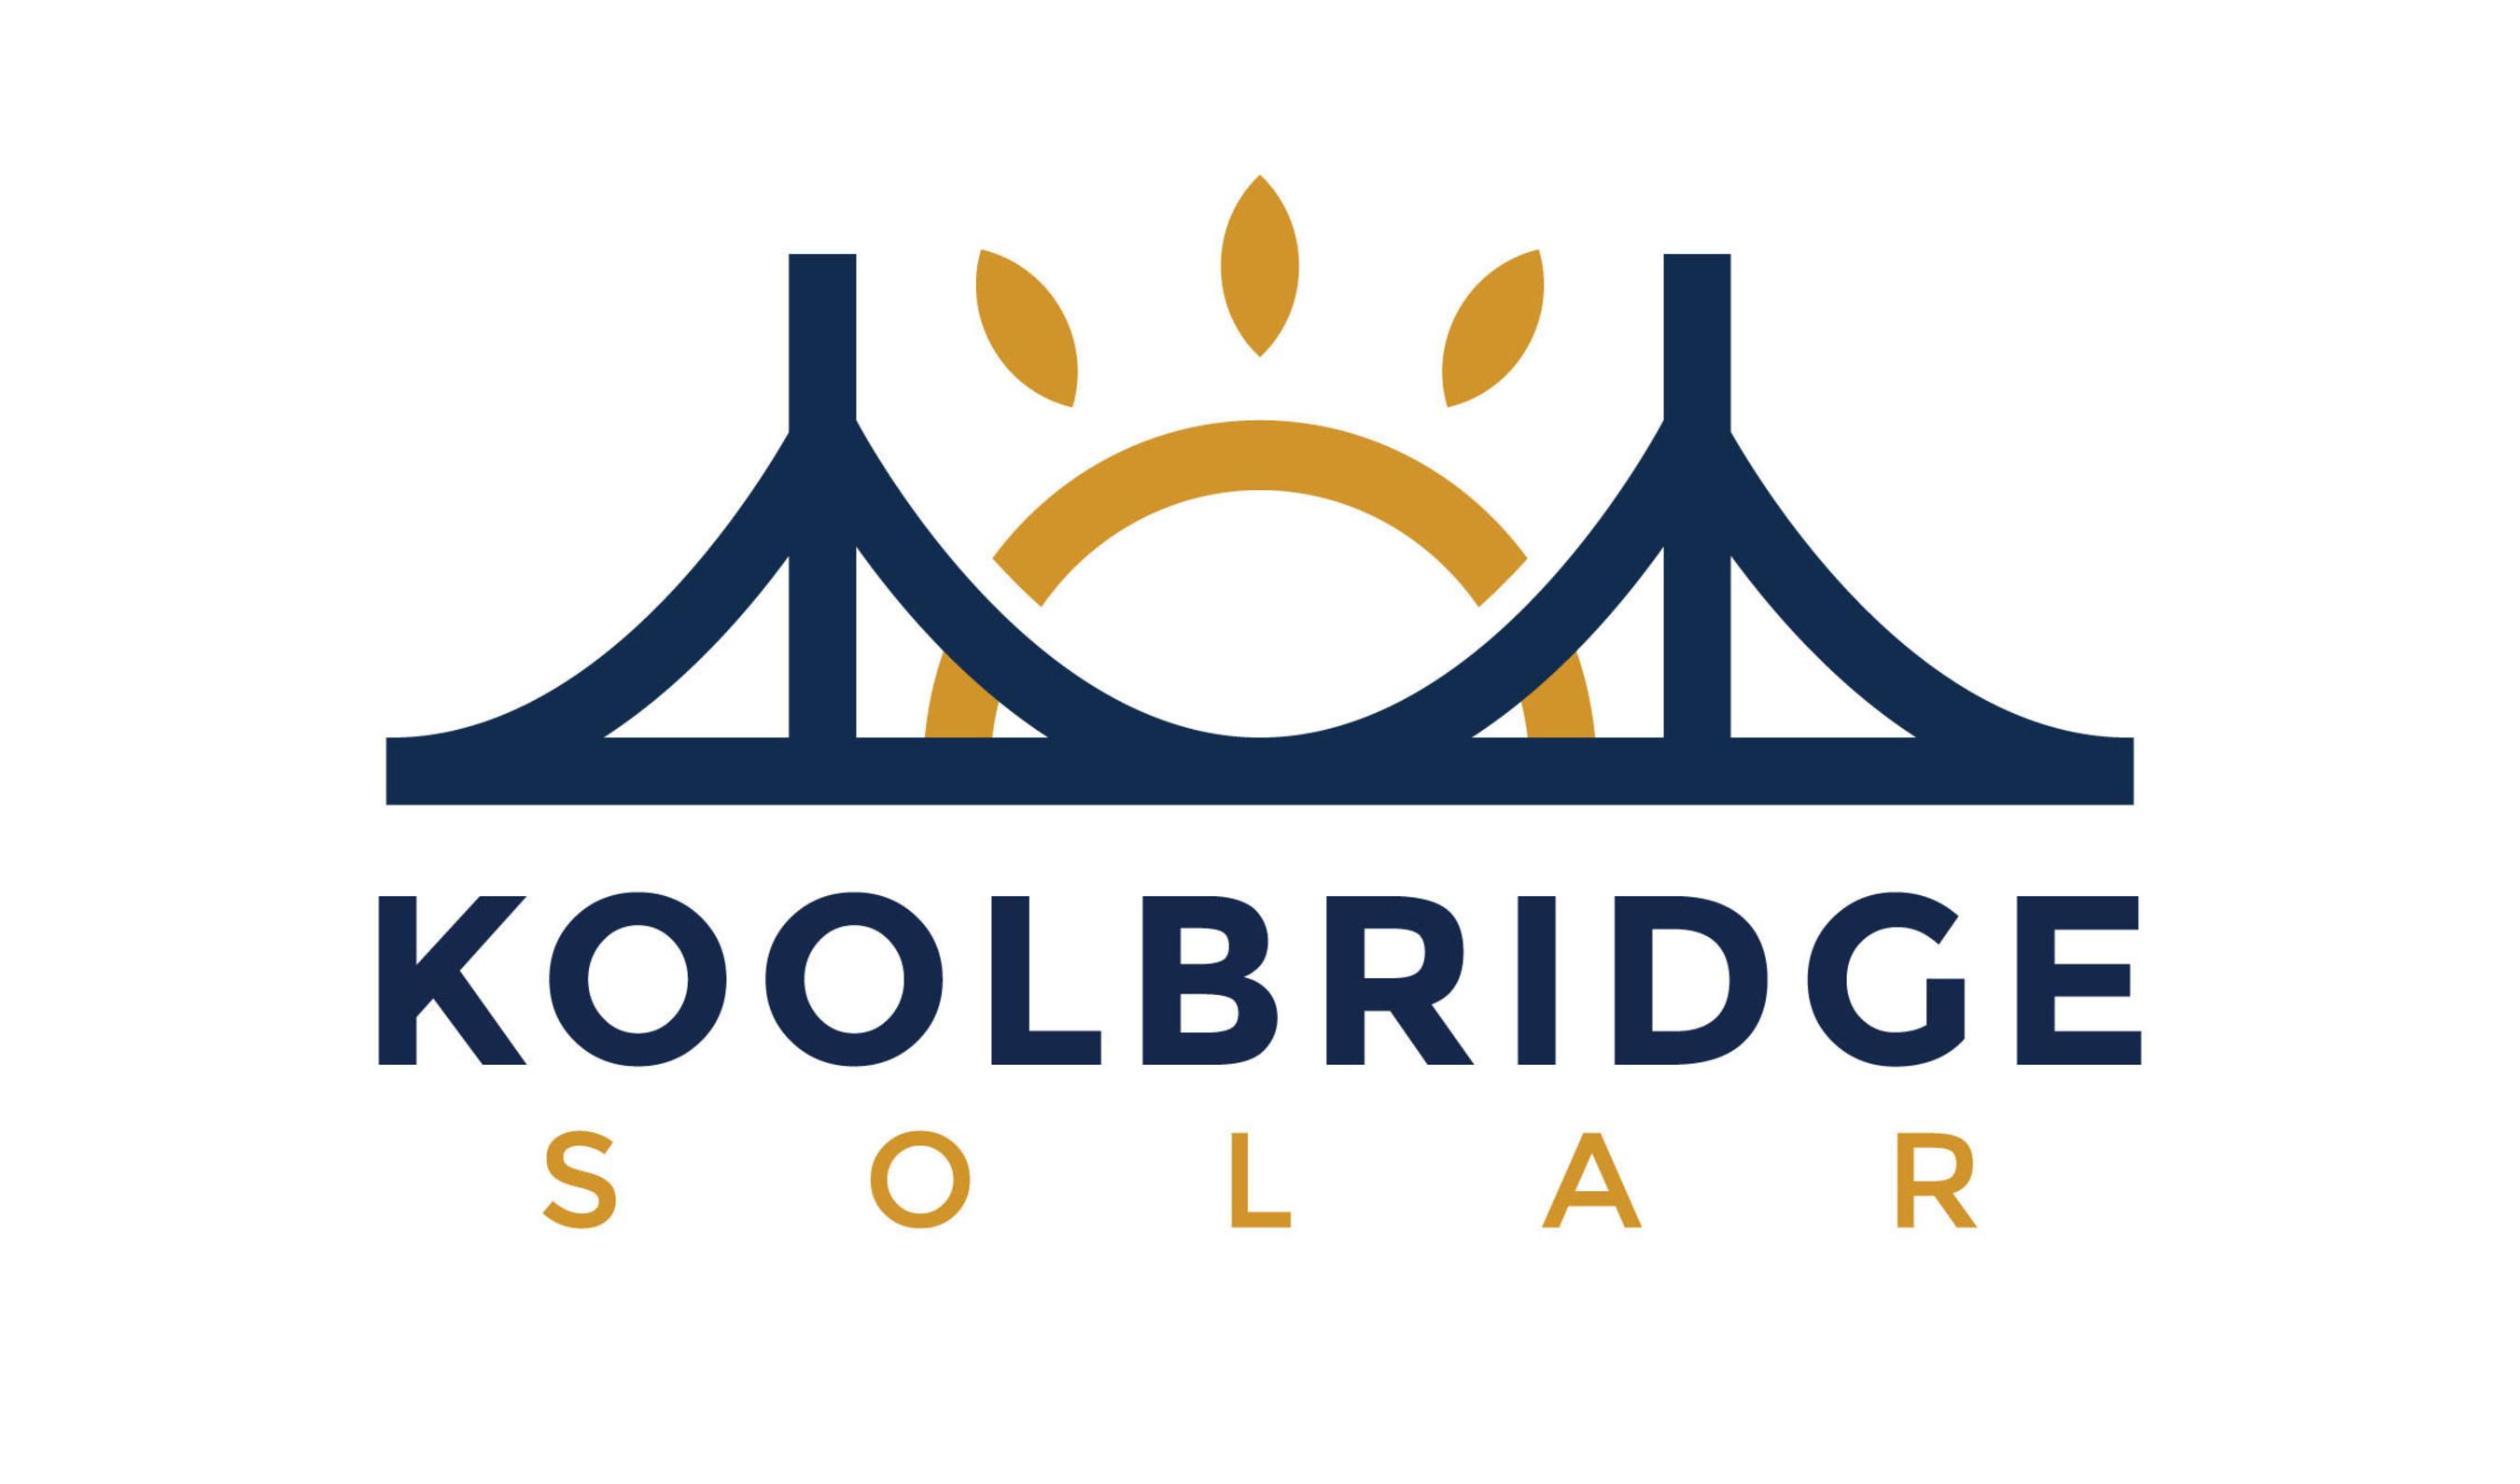 NC Clean Energy Technology Center And Koolbridge Solar Partner On New Solar Technology